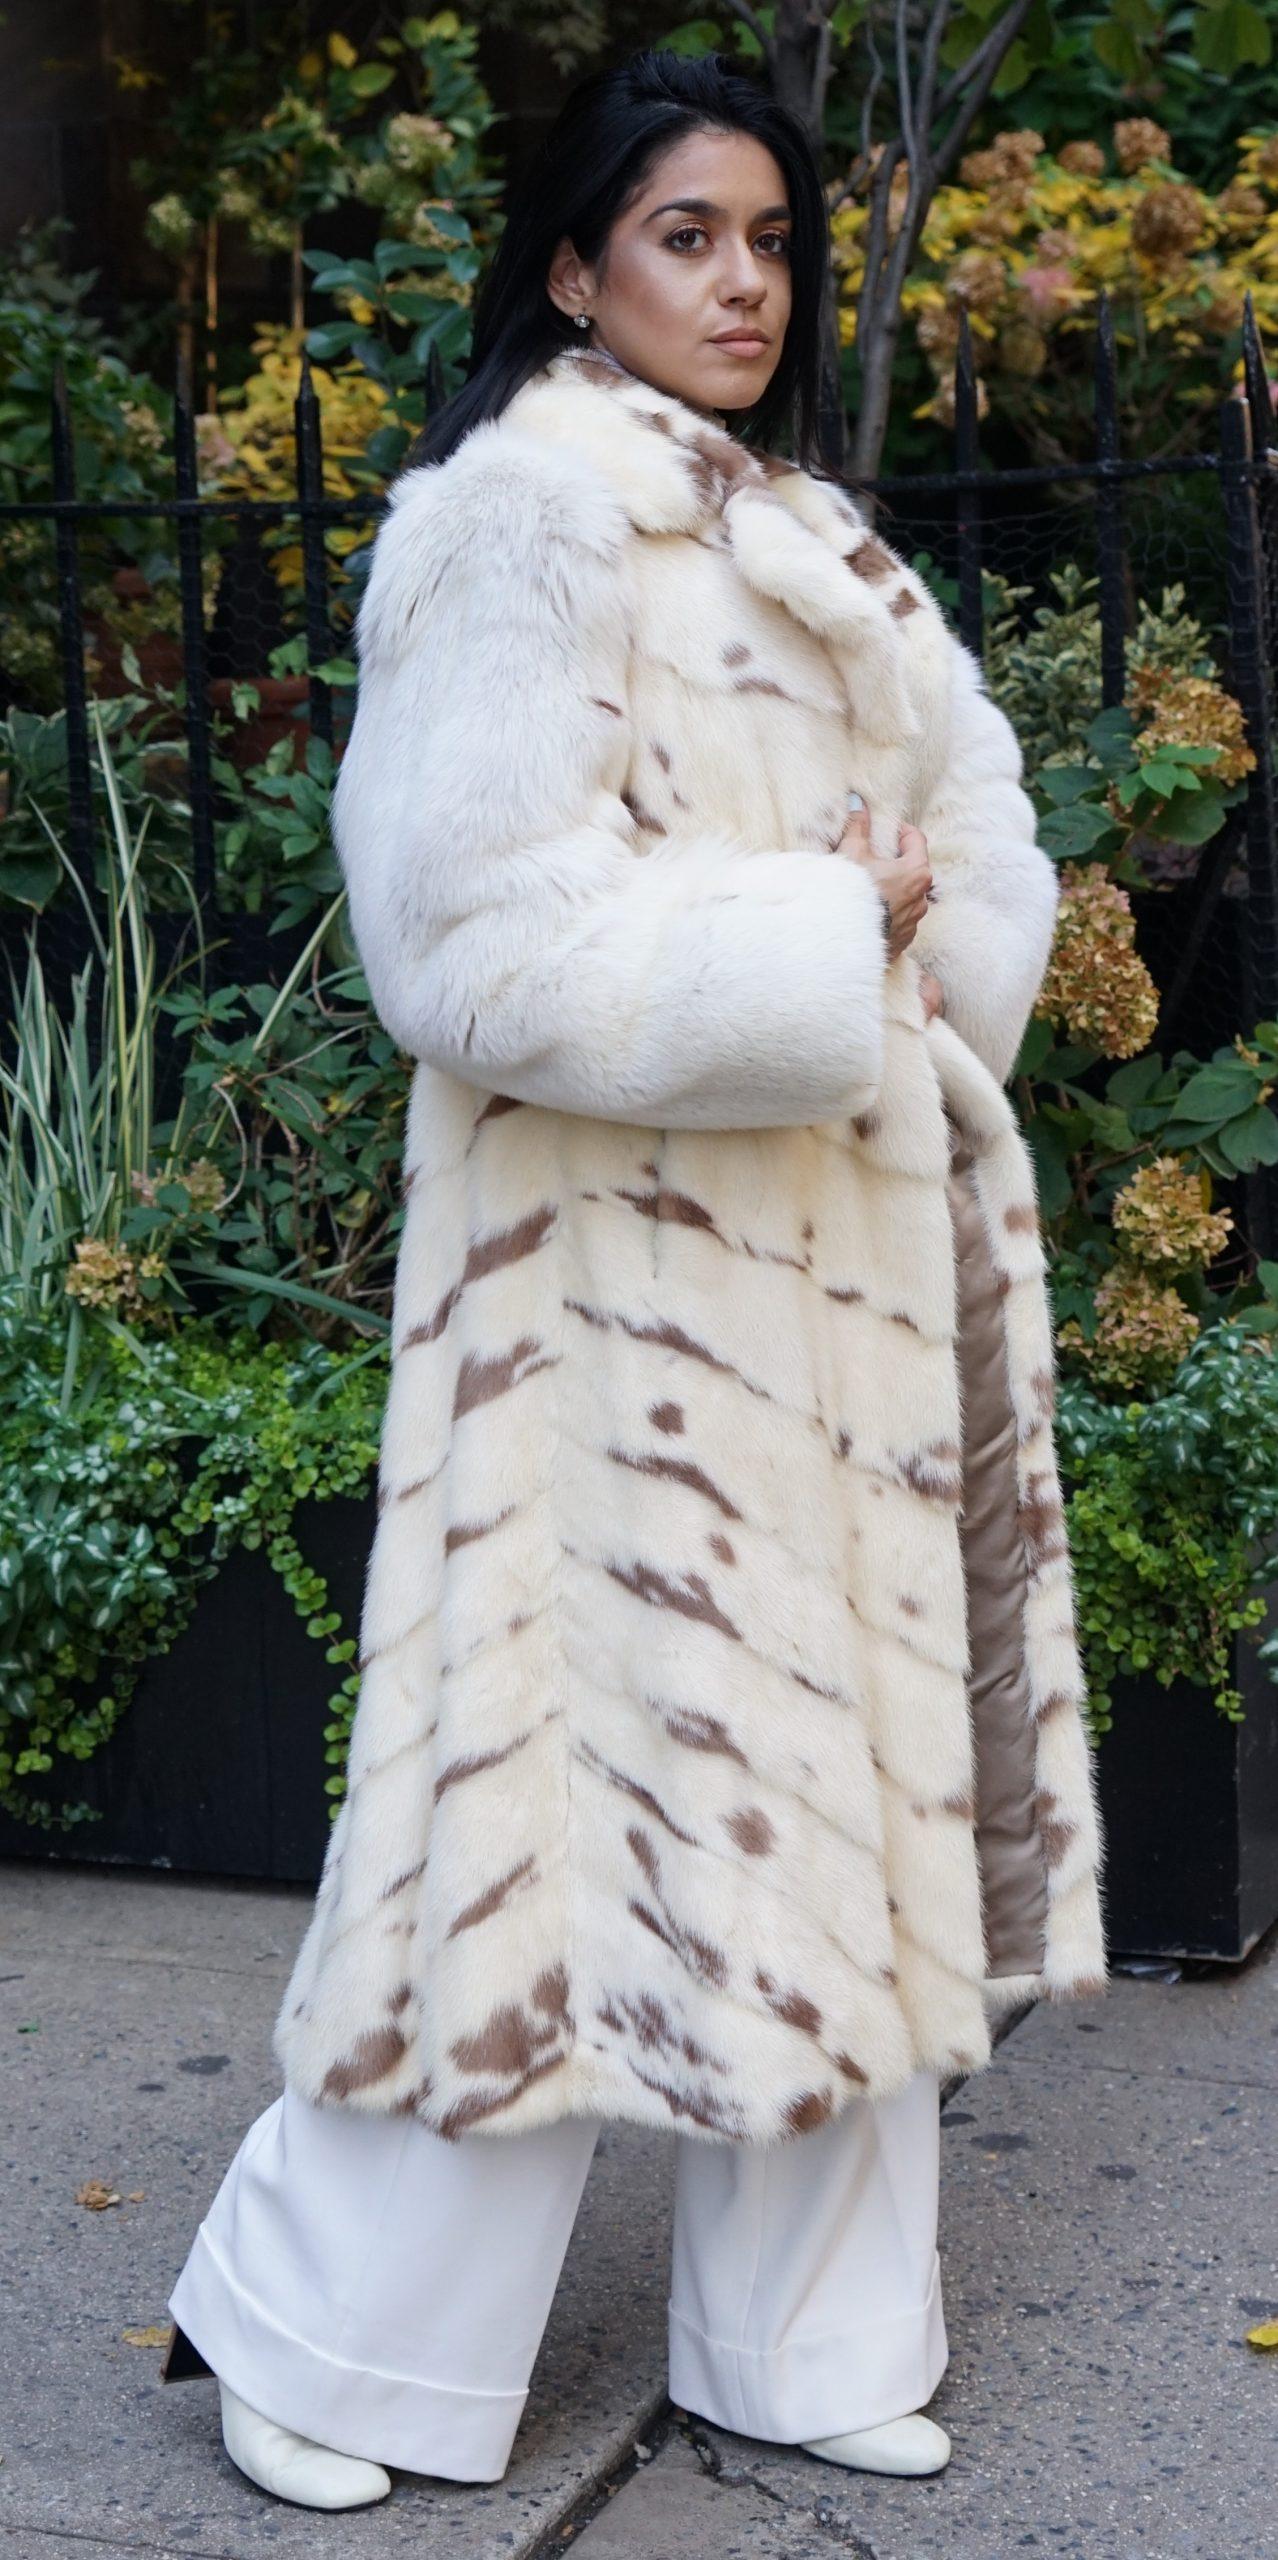 Designer Mink coats